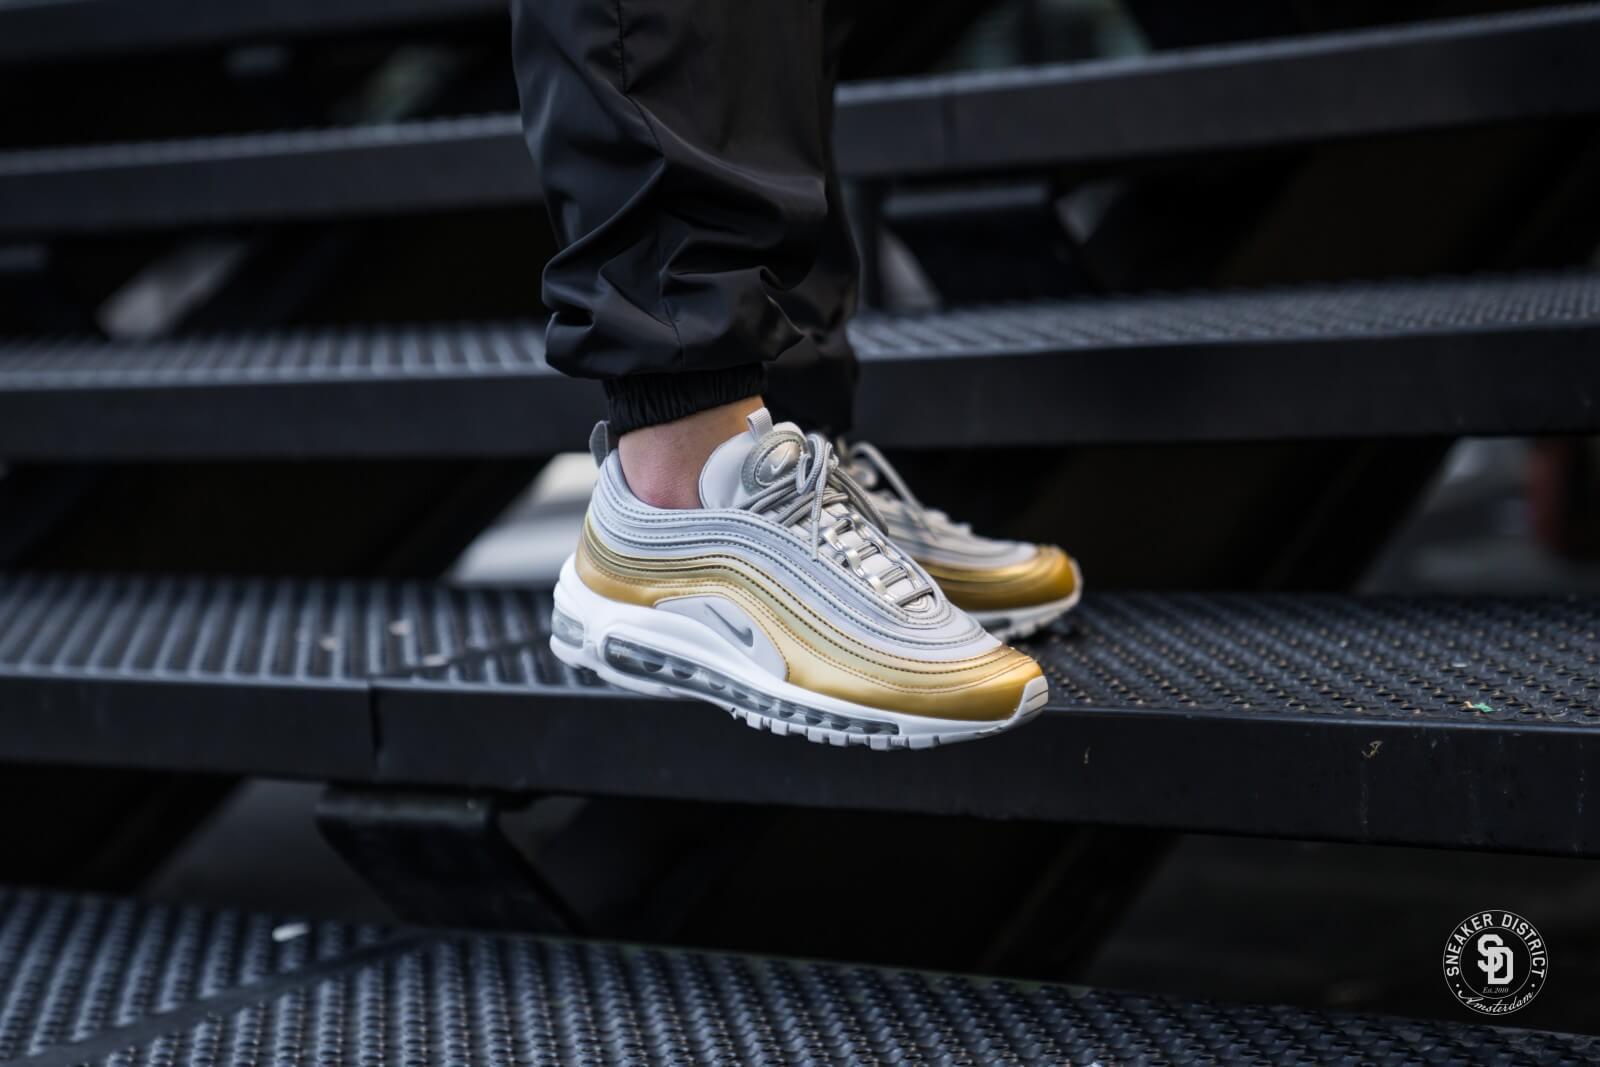 Nike Women's Air Max 97 SE Vast Grey/Metallic Silver-Metallic Gold